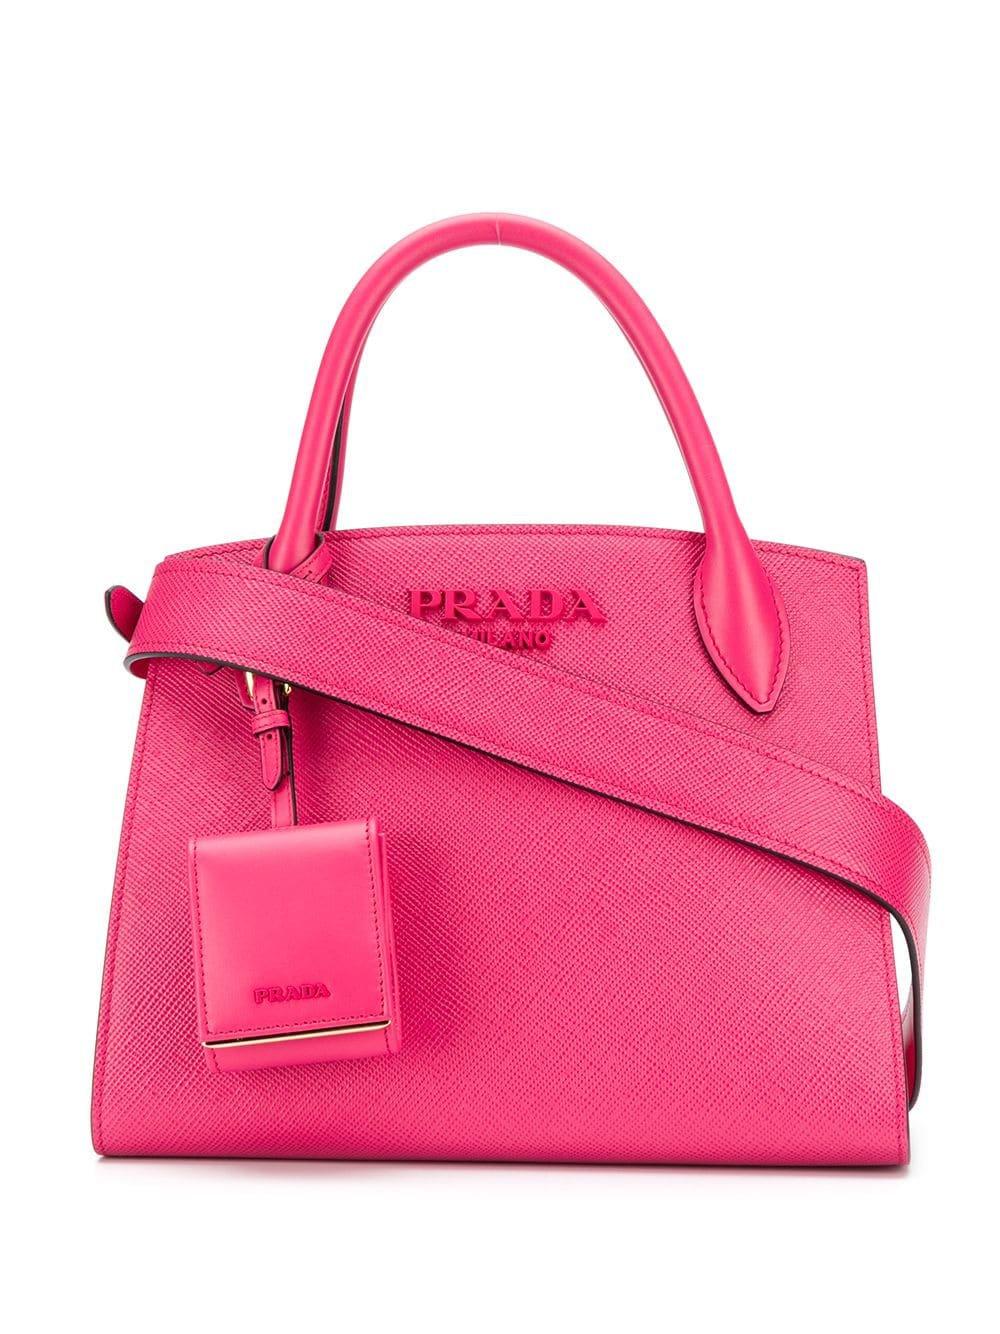 Prada borsa tote bag £1,490 - Shop Online - Fast Global Shipping, Price